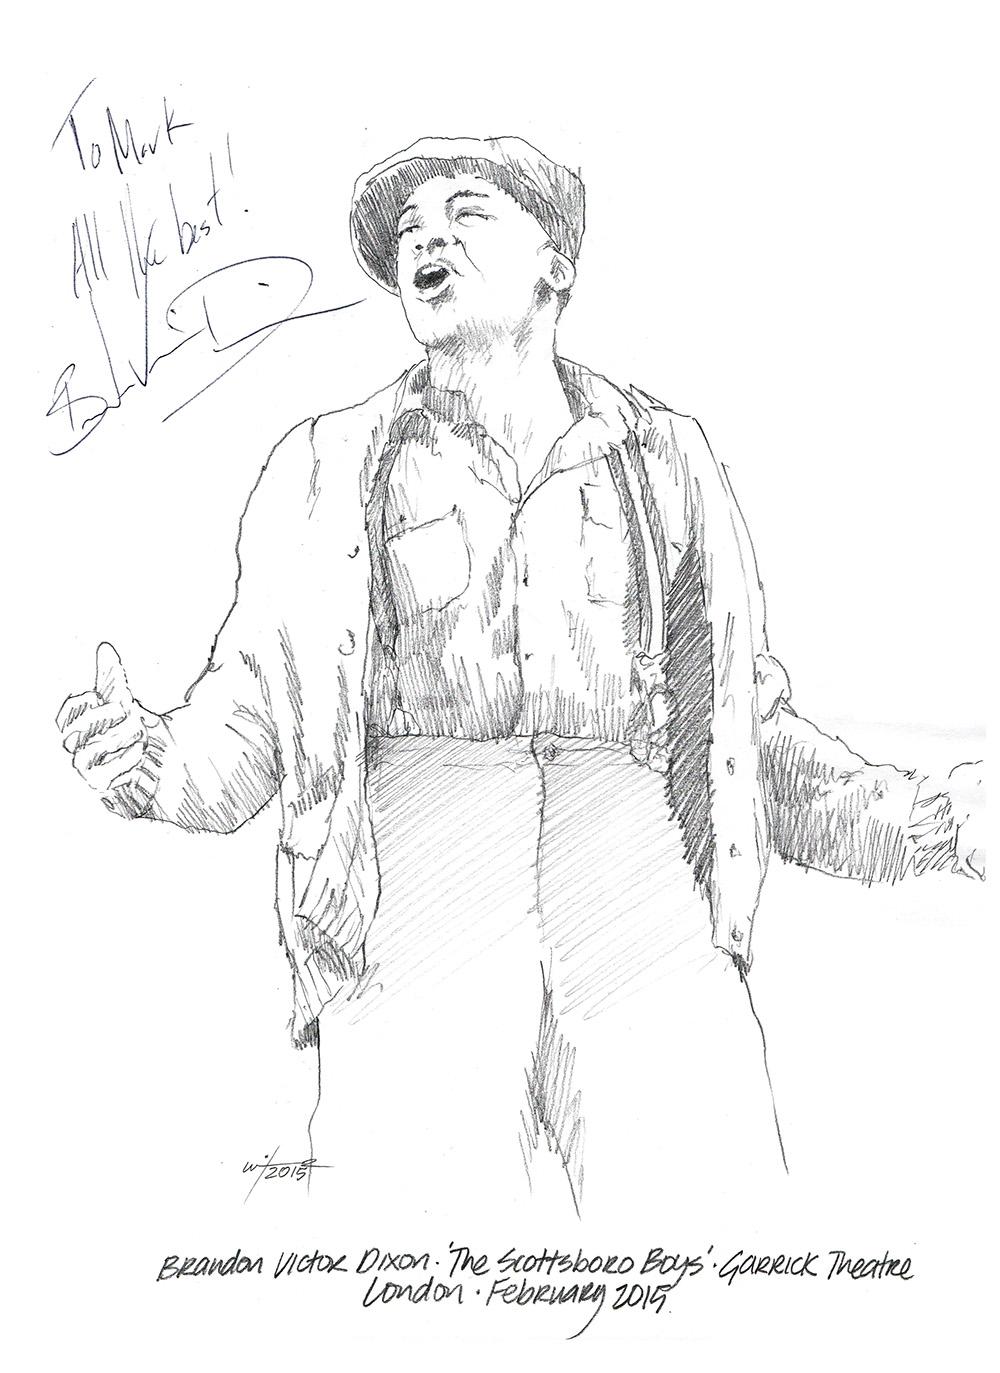 Drawing: Brandon Victor Dixon in The Scottsboro Boys